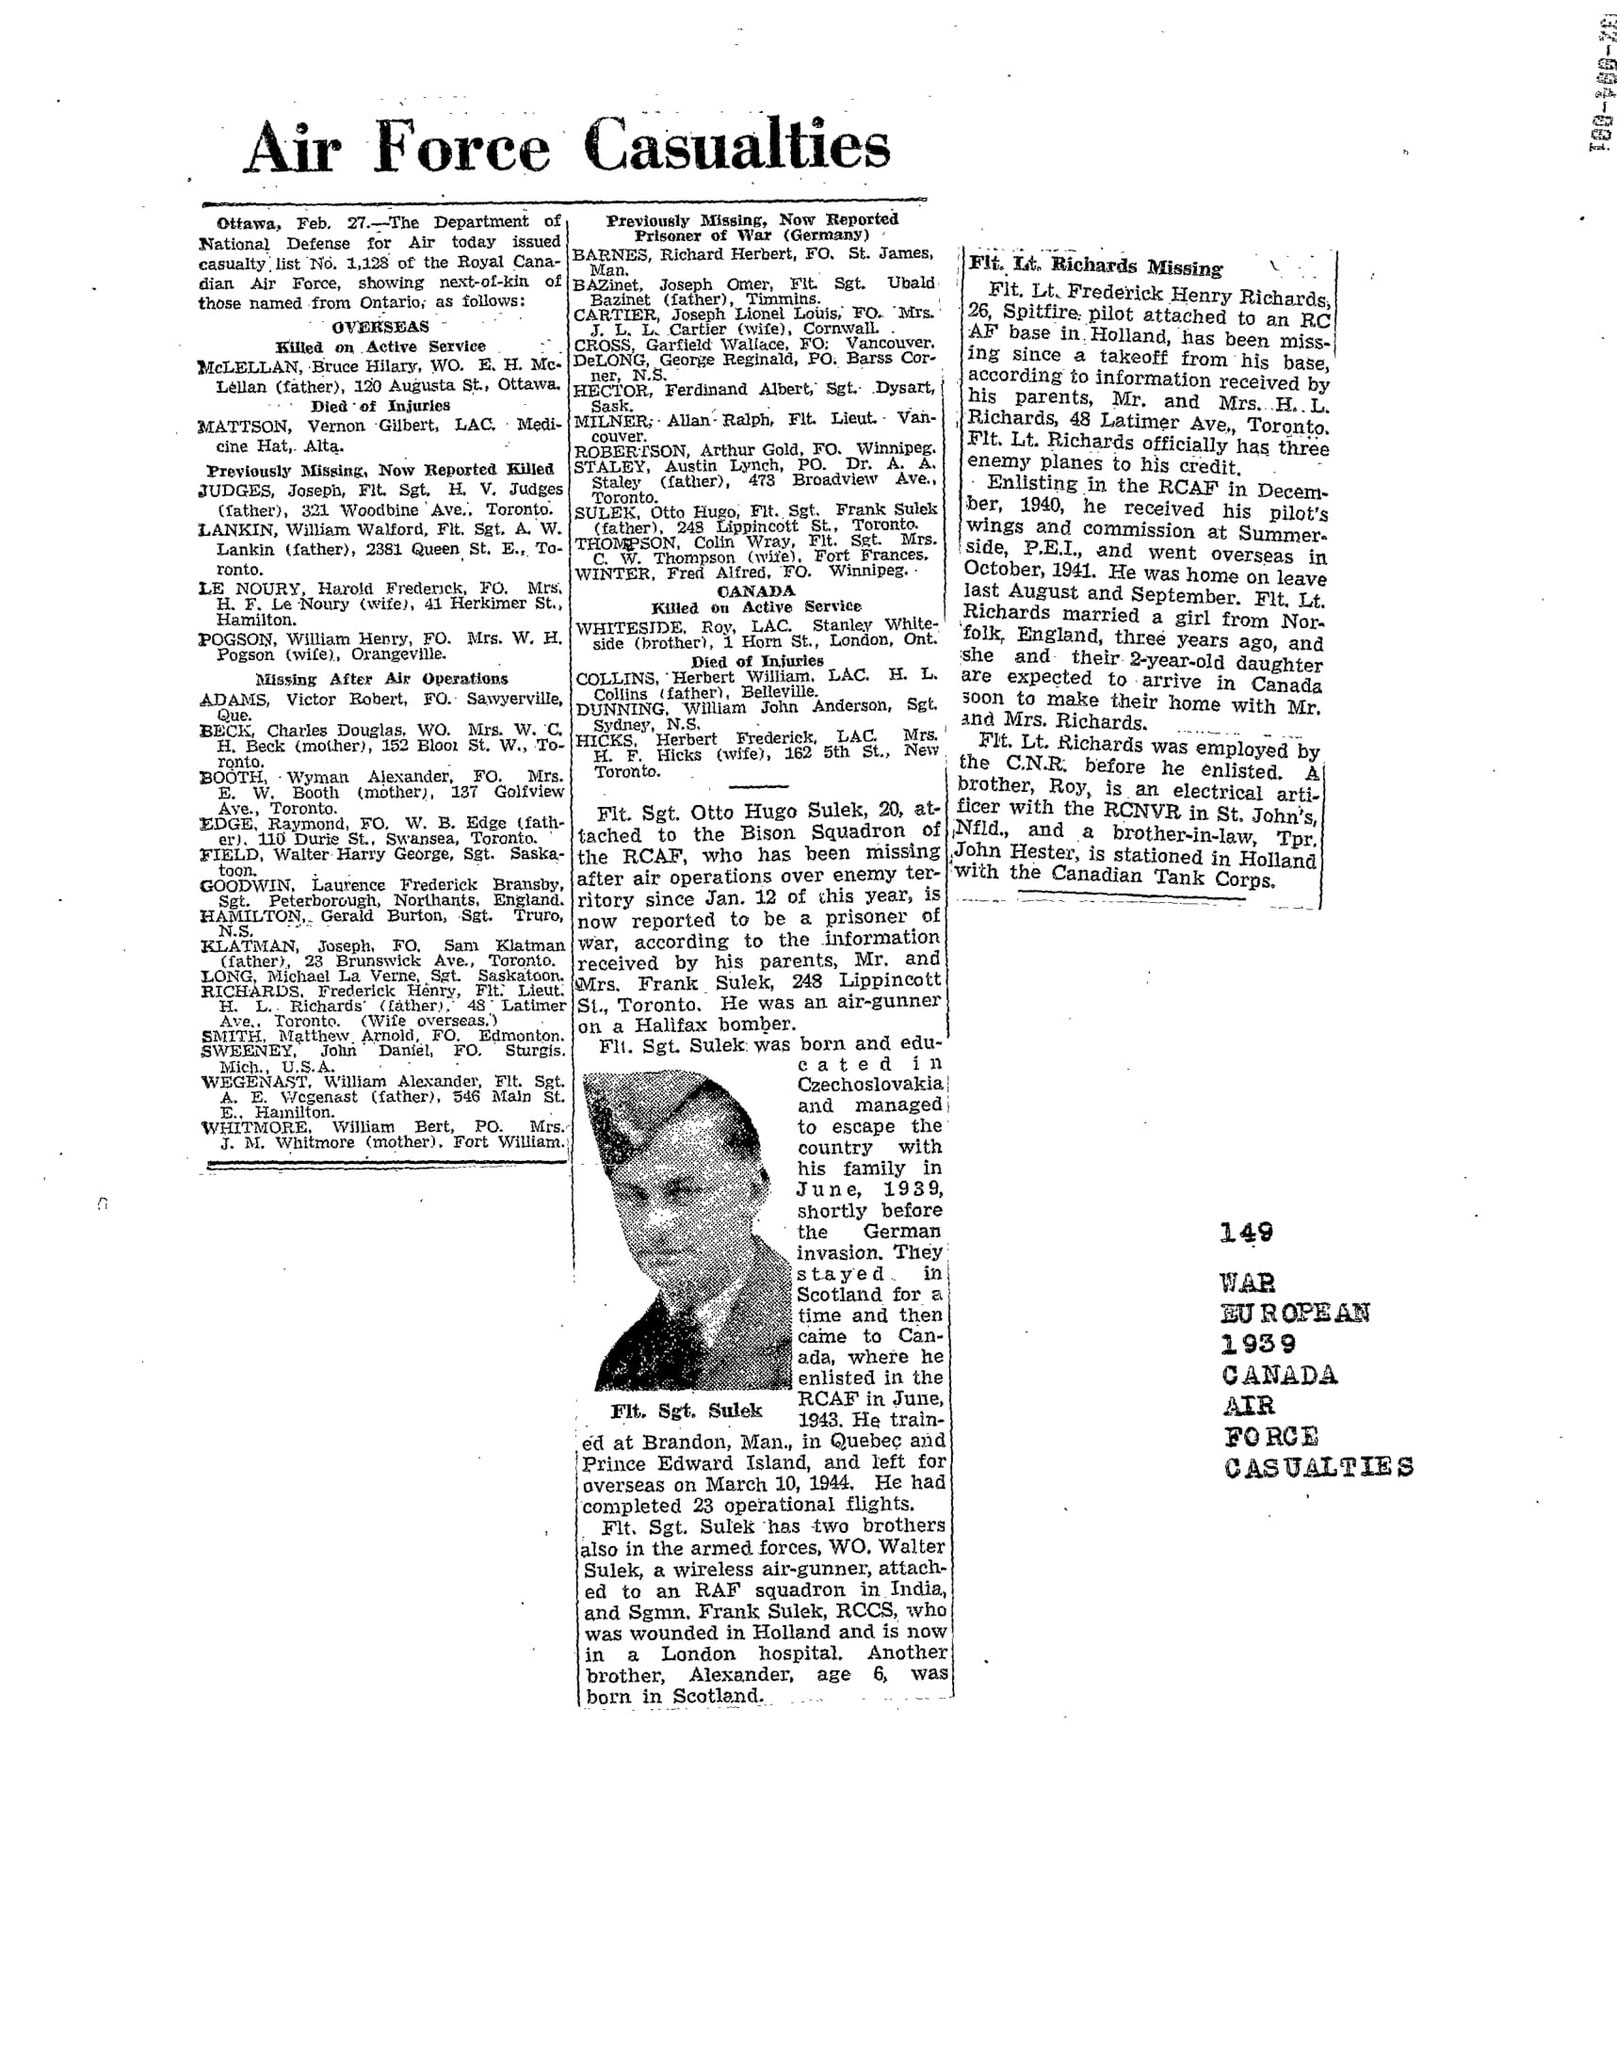 Globe and Mail 28-2-1945